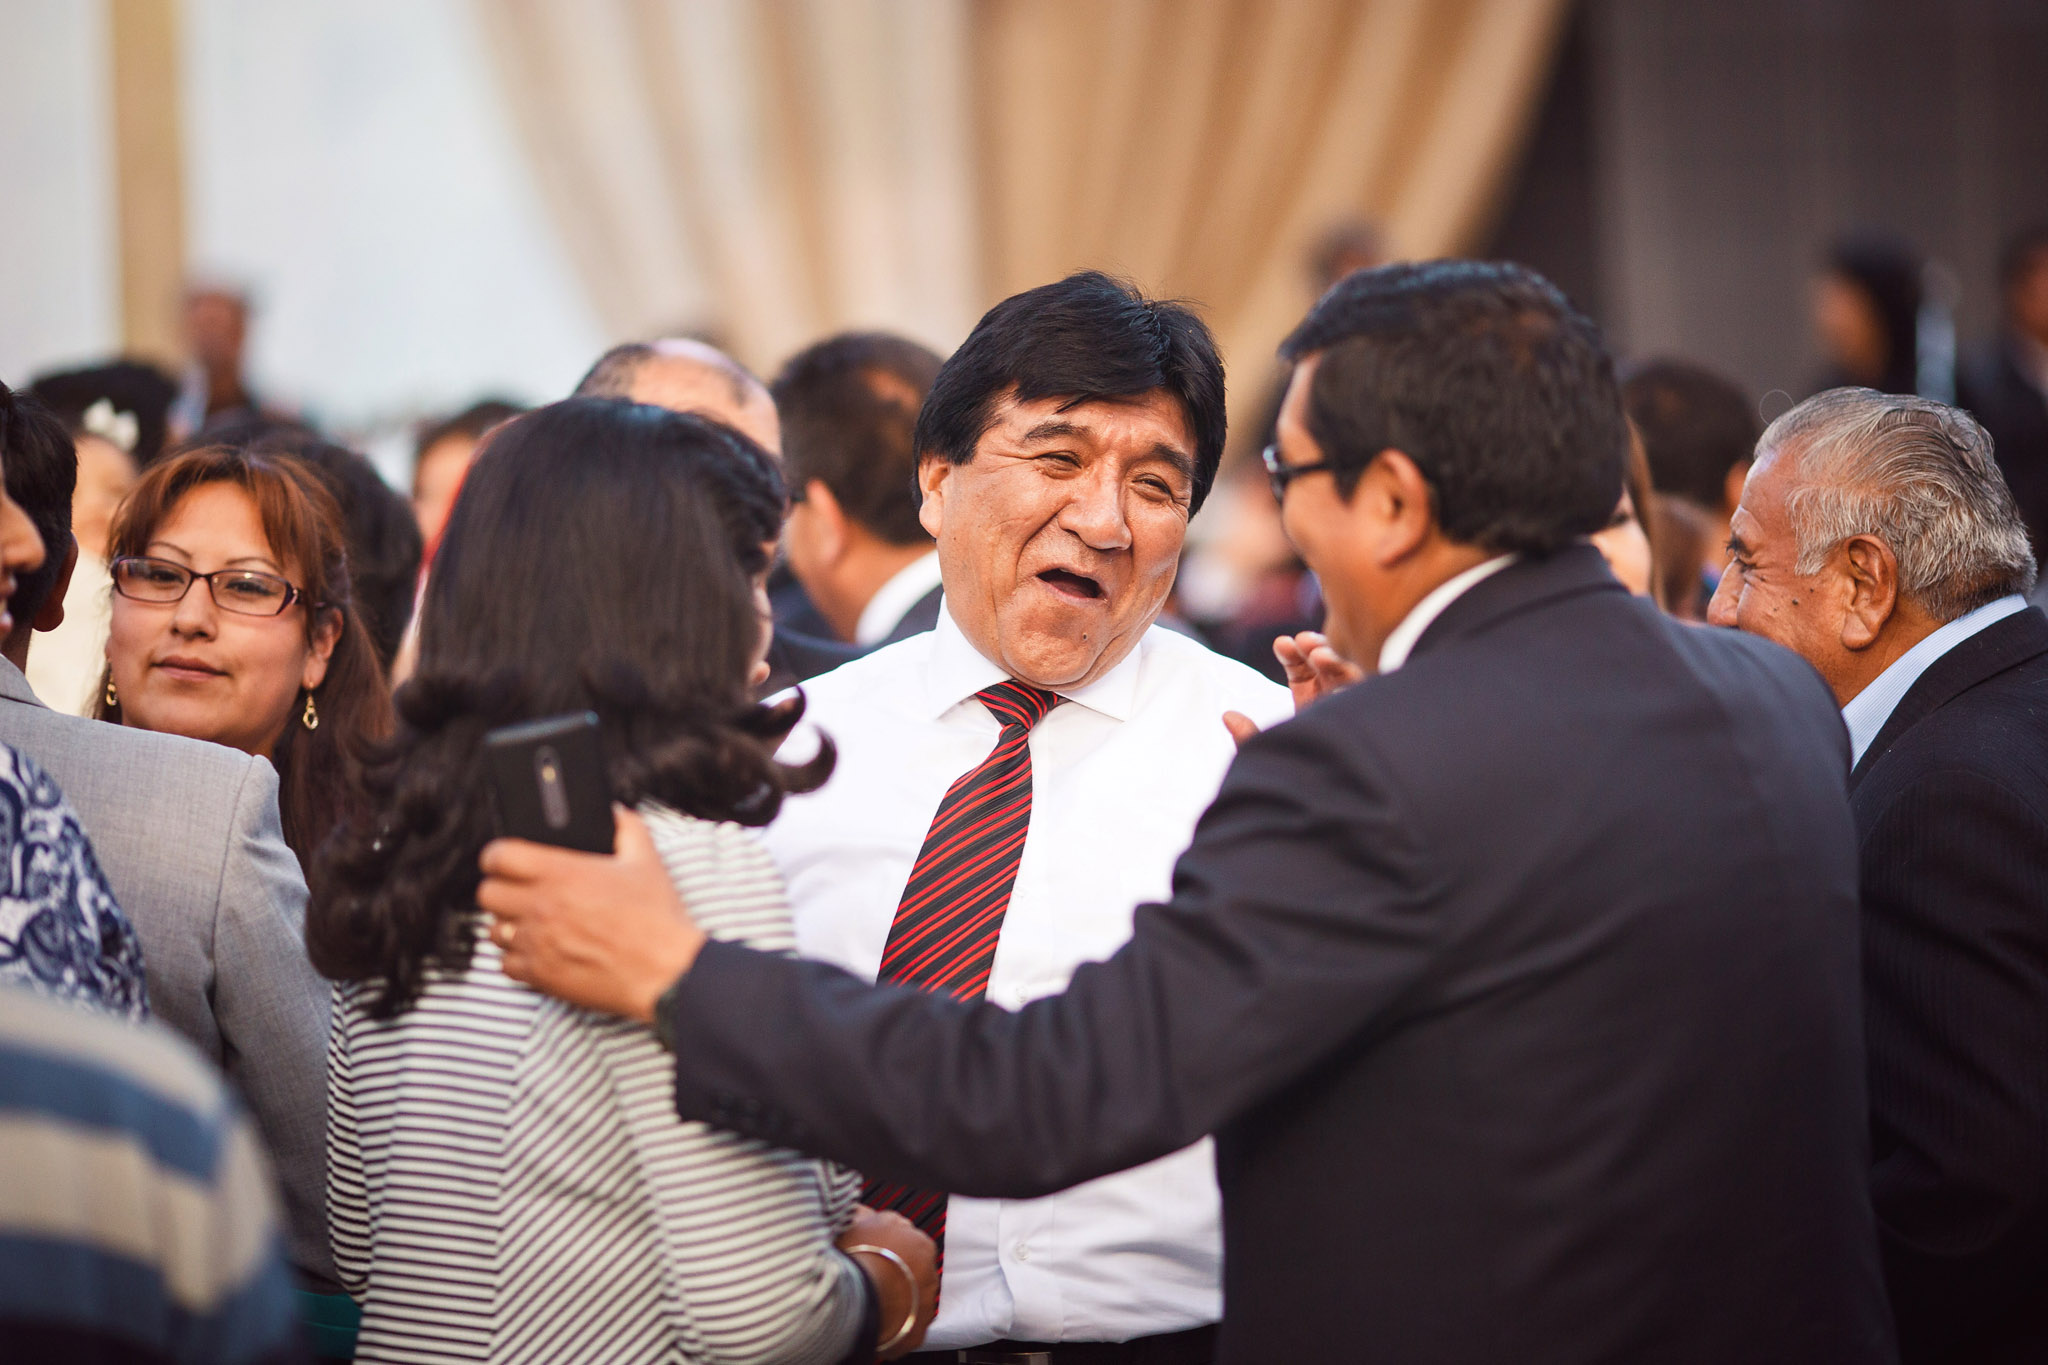 cusco-peru-wedding-destination-party